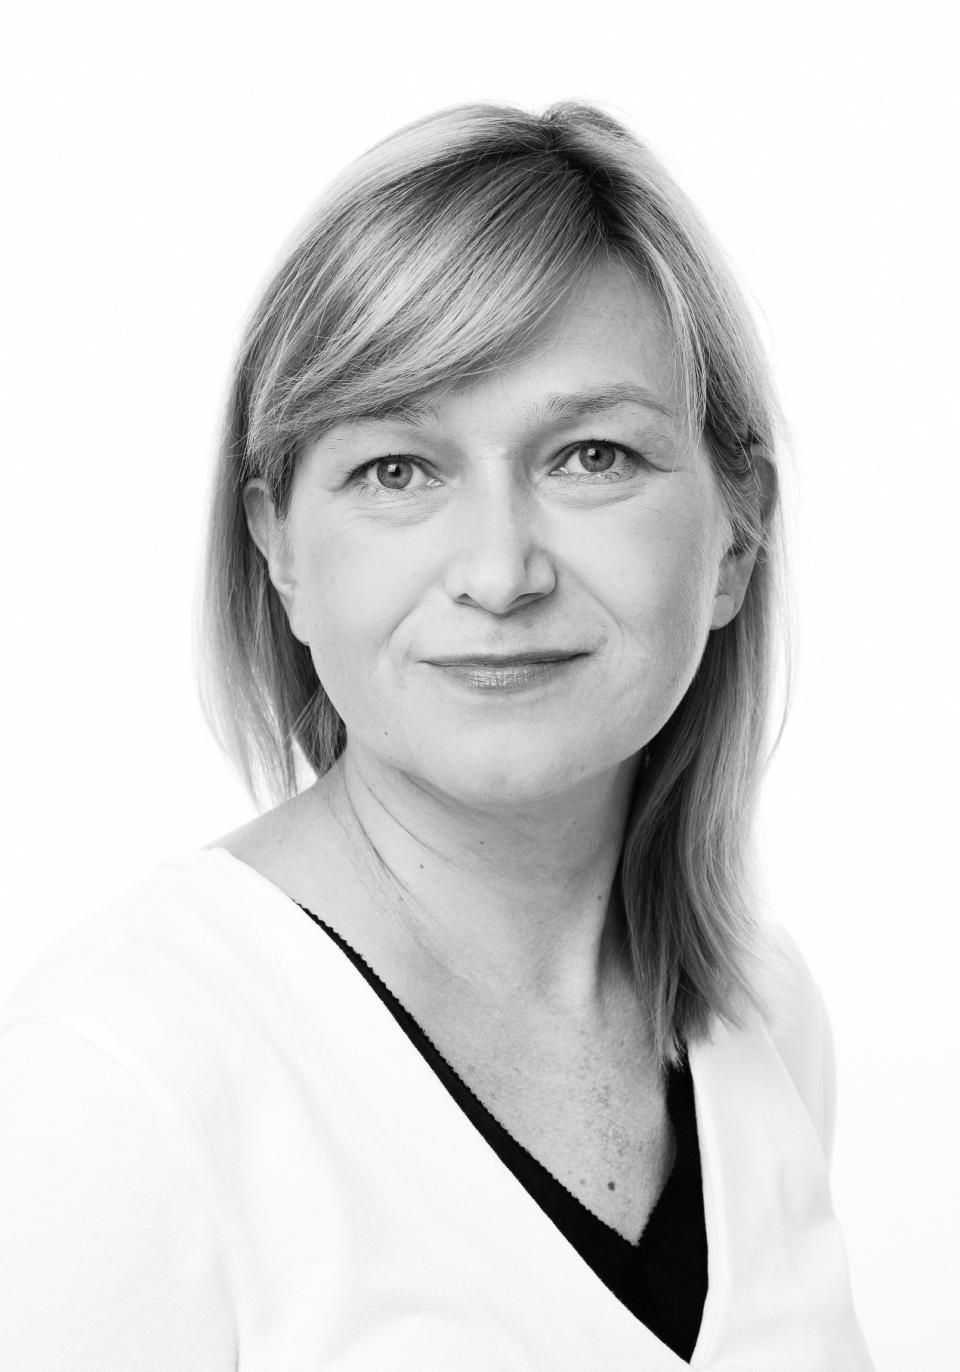 Nele Brandmeister